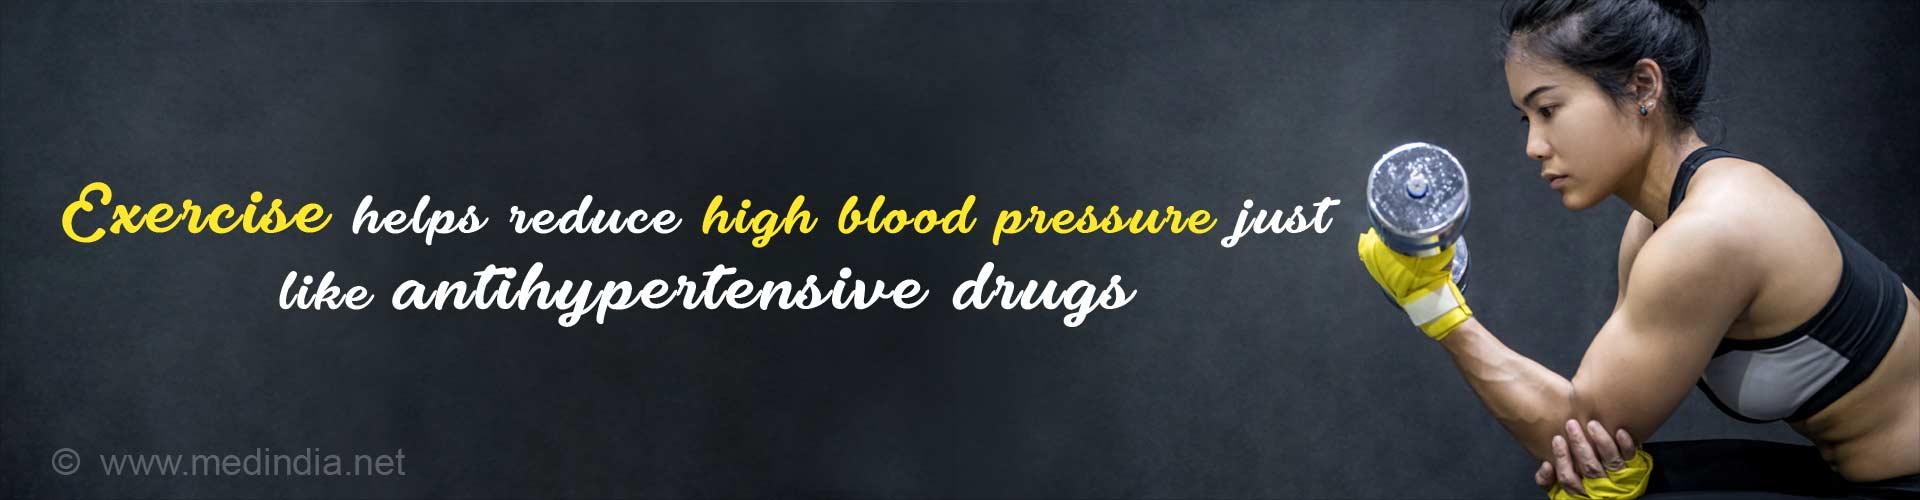 Exercise helps reduce high blood pressure just like antihypertensive drugs.